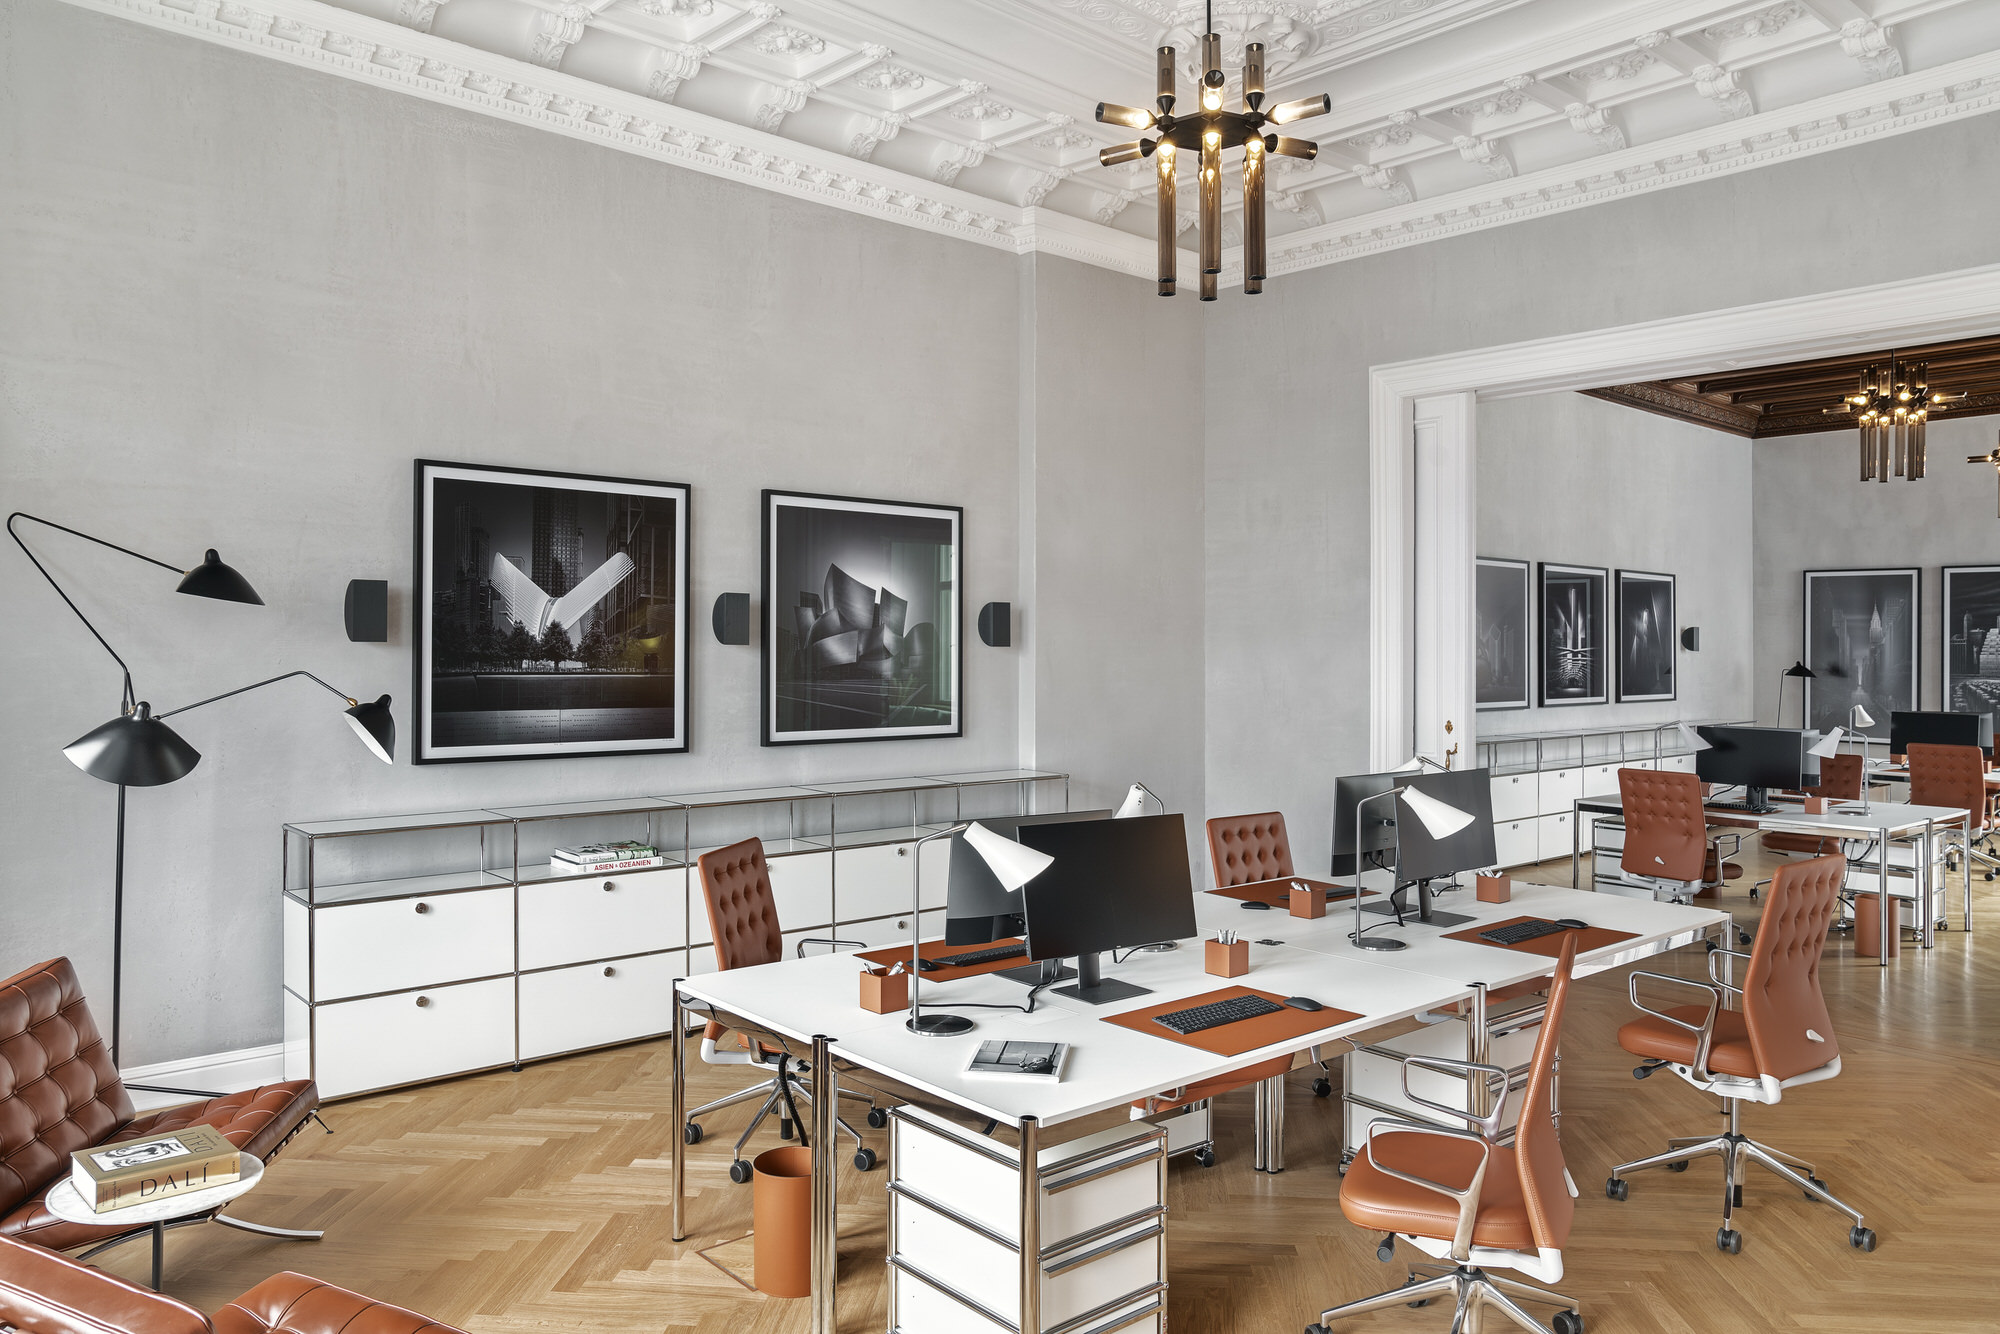 Maria Murawsky, Office E Berlin, Luxury Office Interiors, Photo Tom Kurek | Yellowtrace